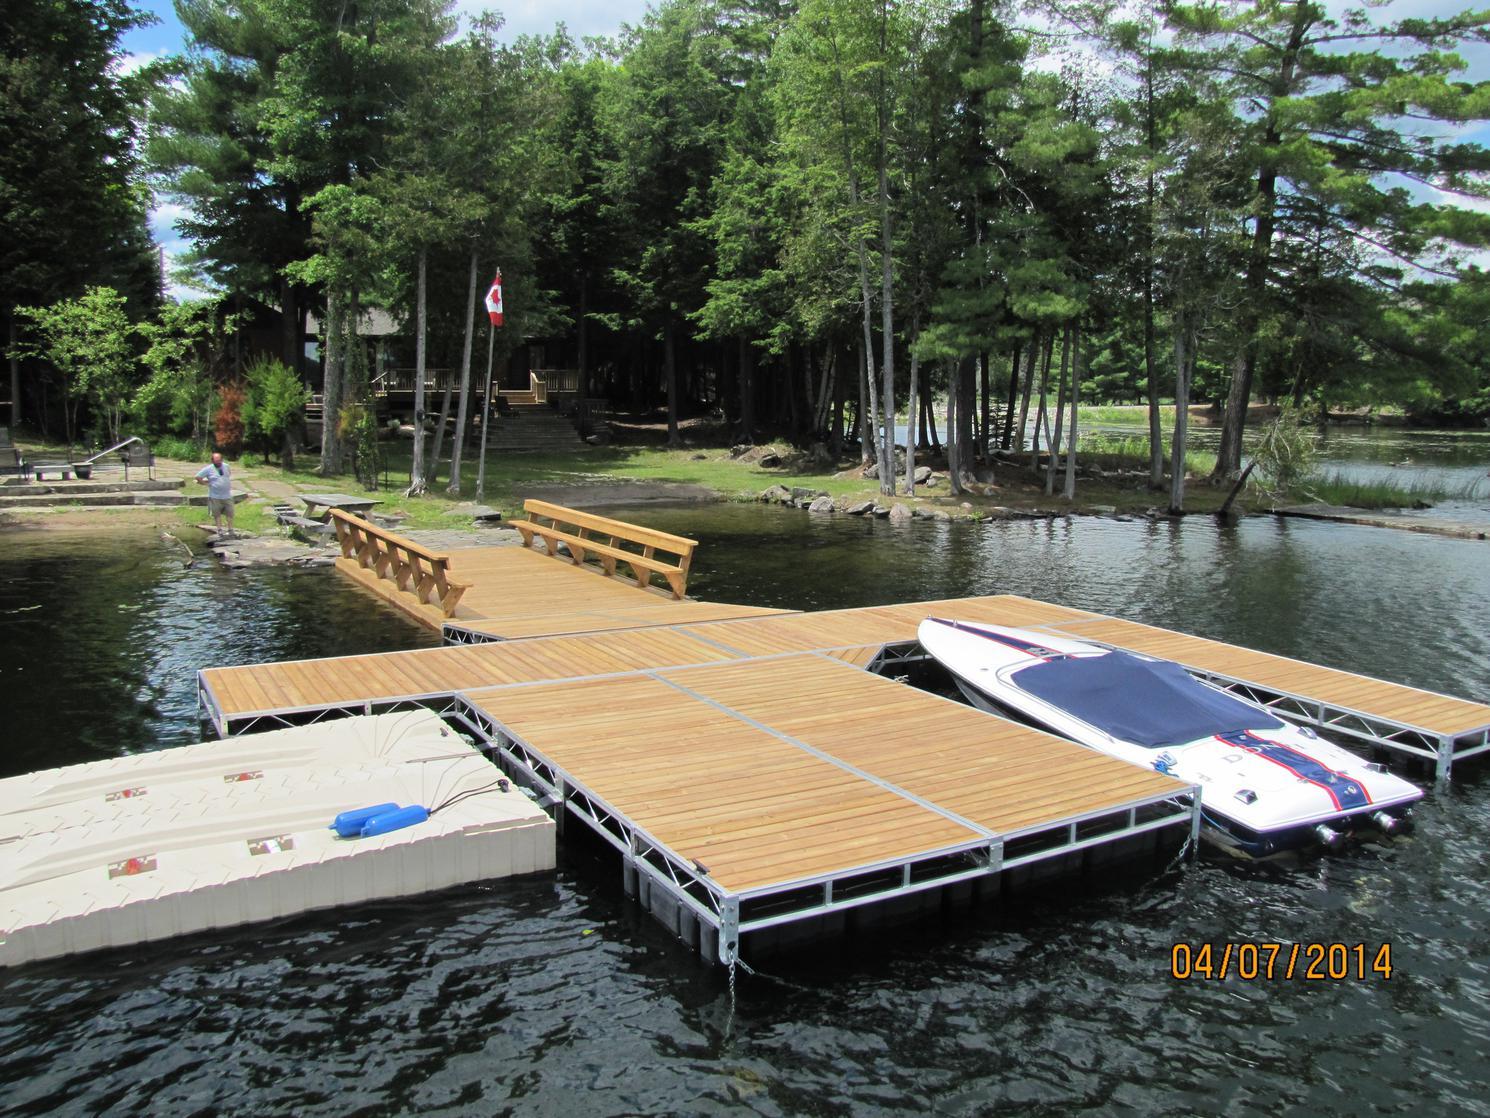 2021 ShoreMaster Infinity FTS-9 Floating dock